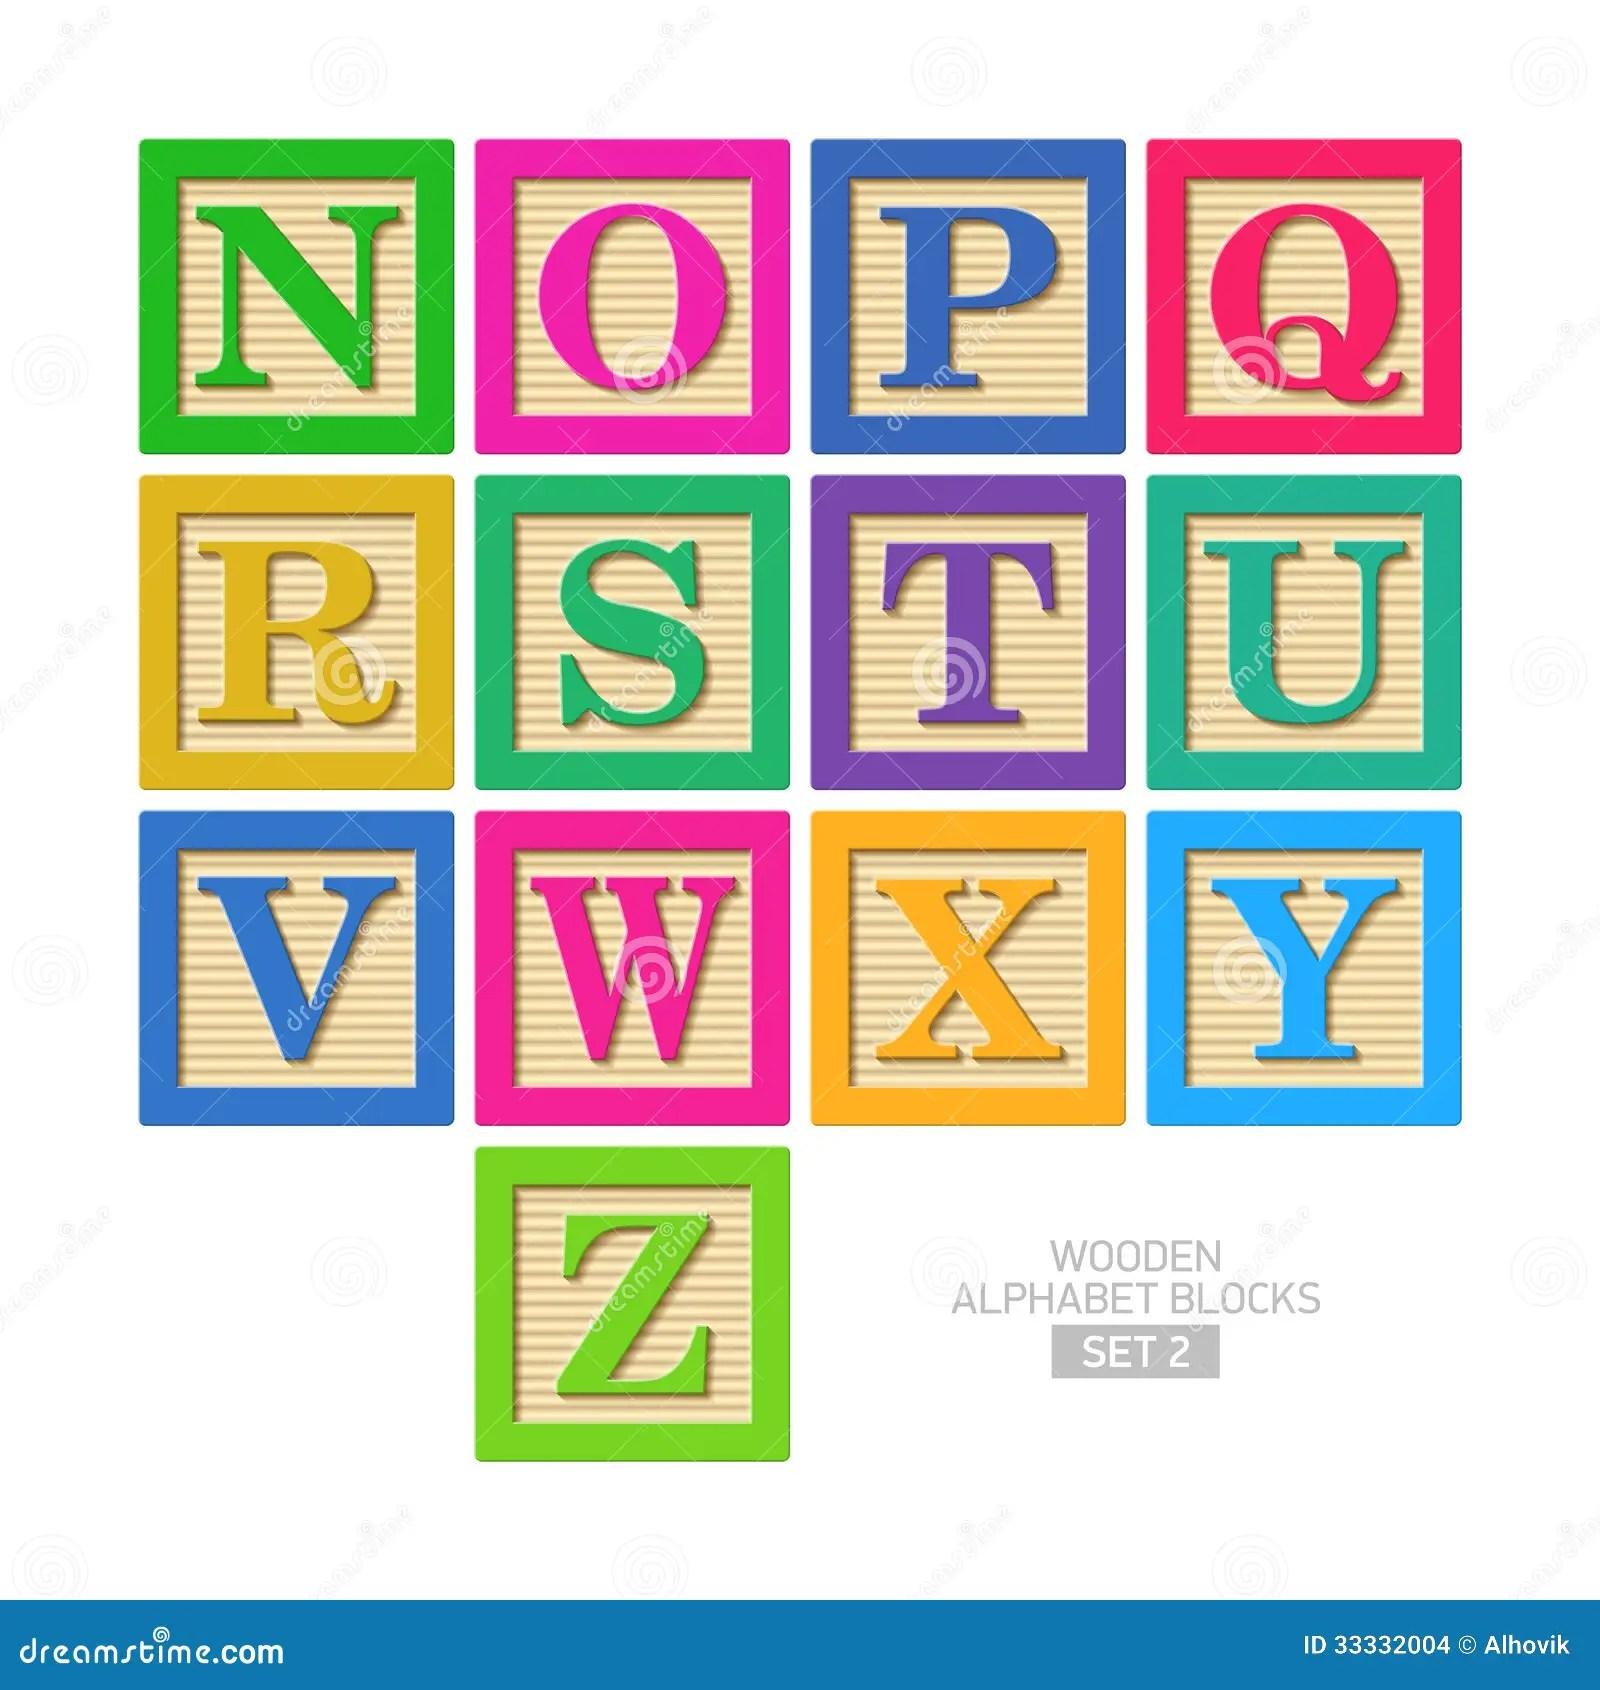 Wooden Alphabet Blocks Stock Vector Illustration Of Game